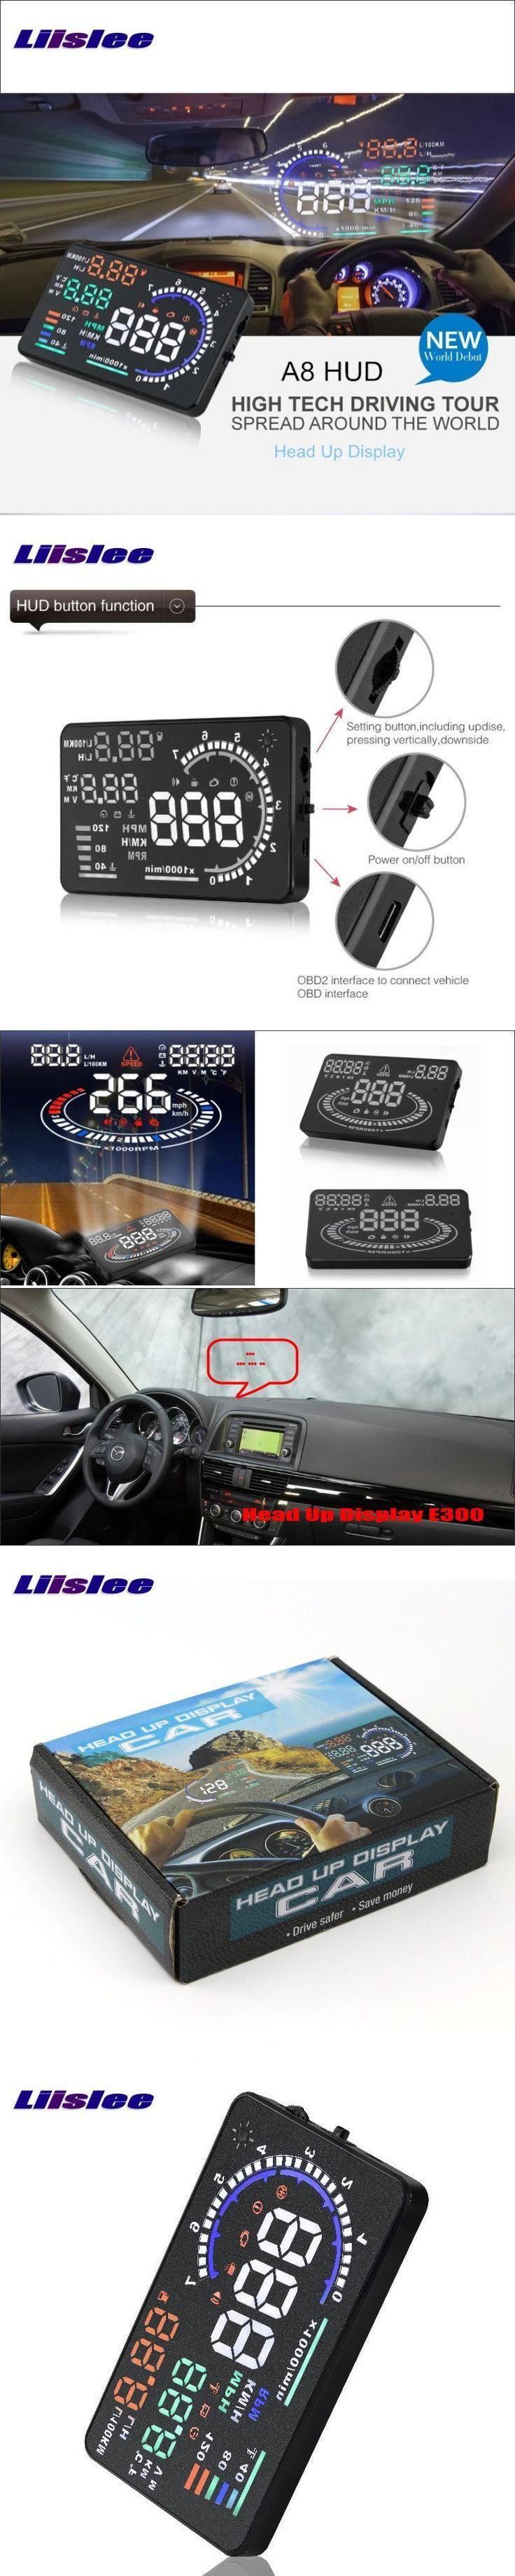 For Mazda Cx 5 Cx 5 Cx5 Safe Driving Screen Modified Car Hud Head Up Display P Car Electronics Car Cx5 Displa Modified Cars Head Up Display Mazda